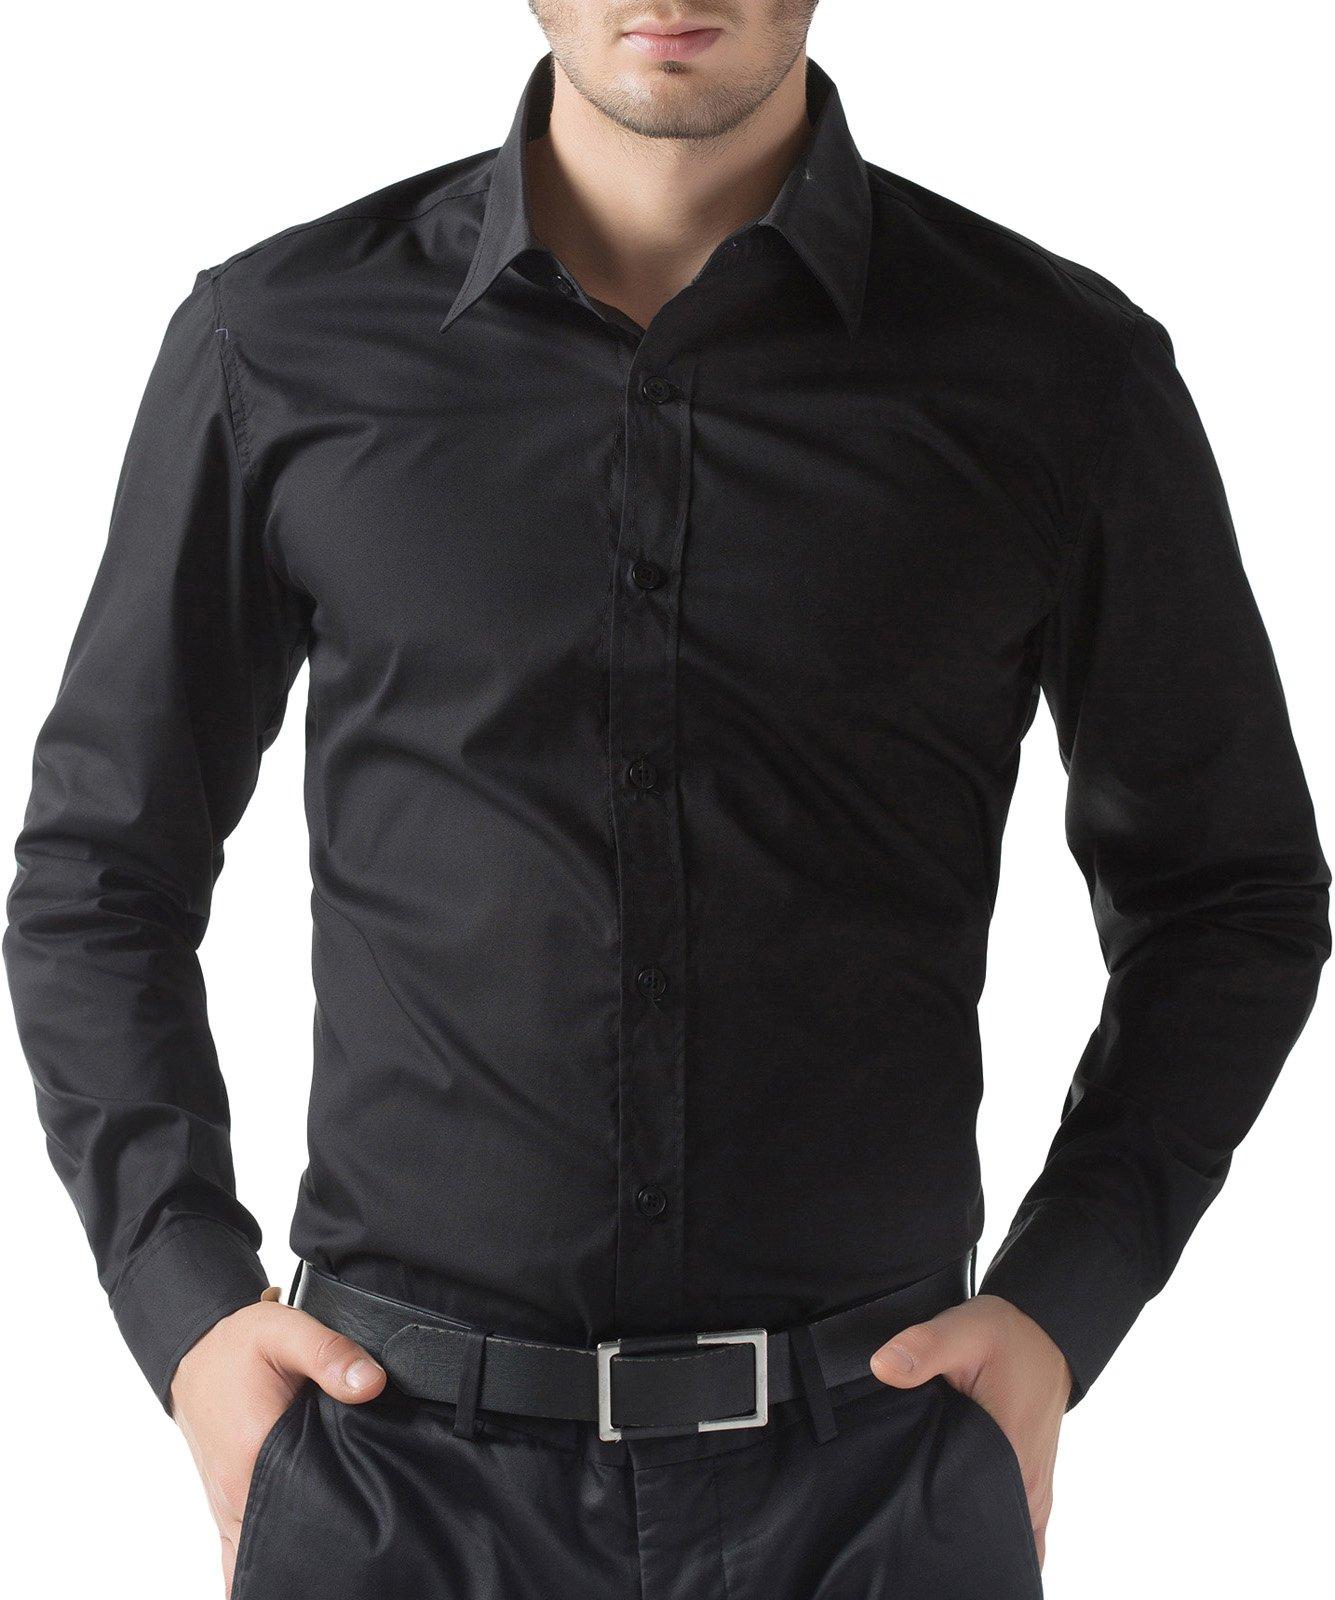 PAUL JONES Classic Black Formal Shirts for Men Business Casual Dress Shirt (M) by PAUL JONES